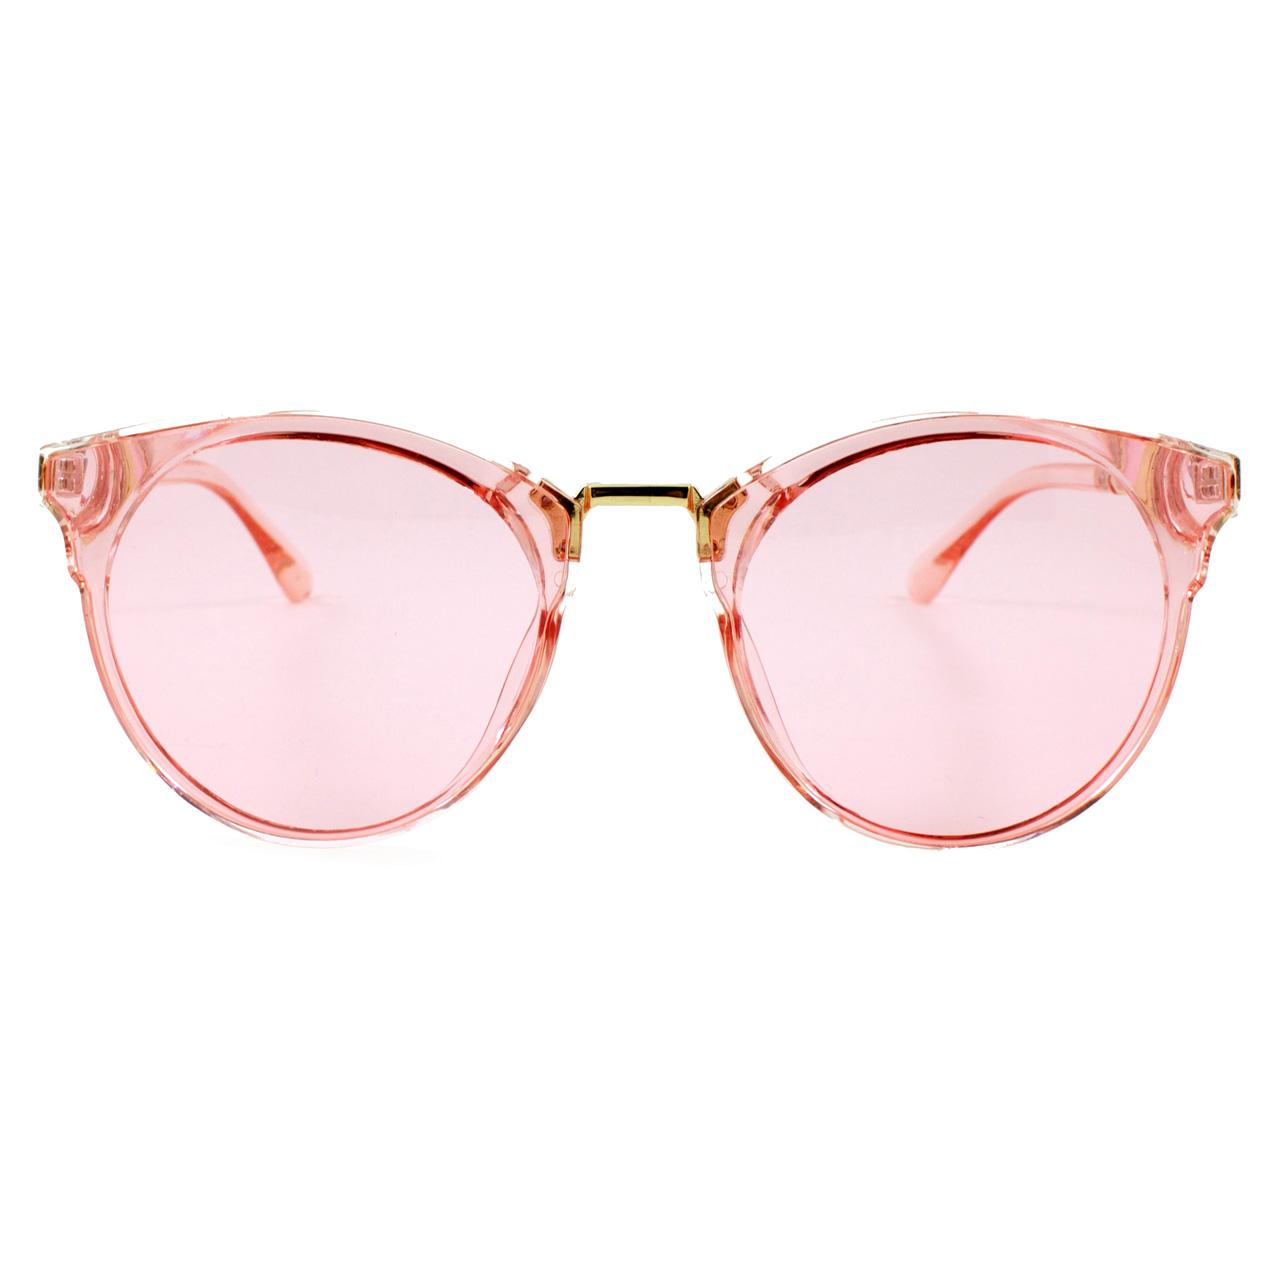 قیمت عینک آفتابی زنانه مدل Daily Pink Series